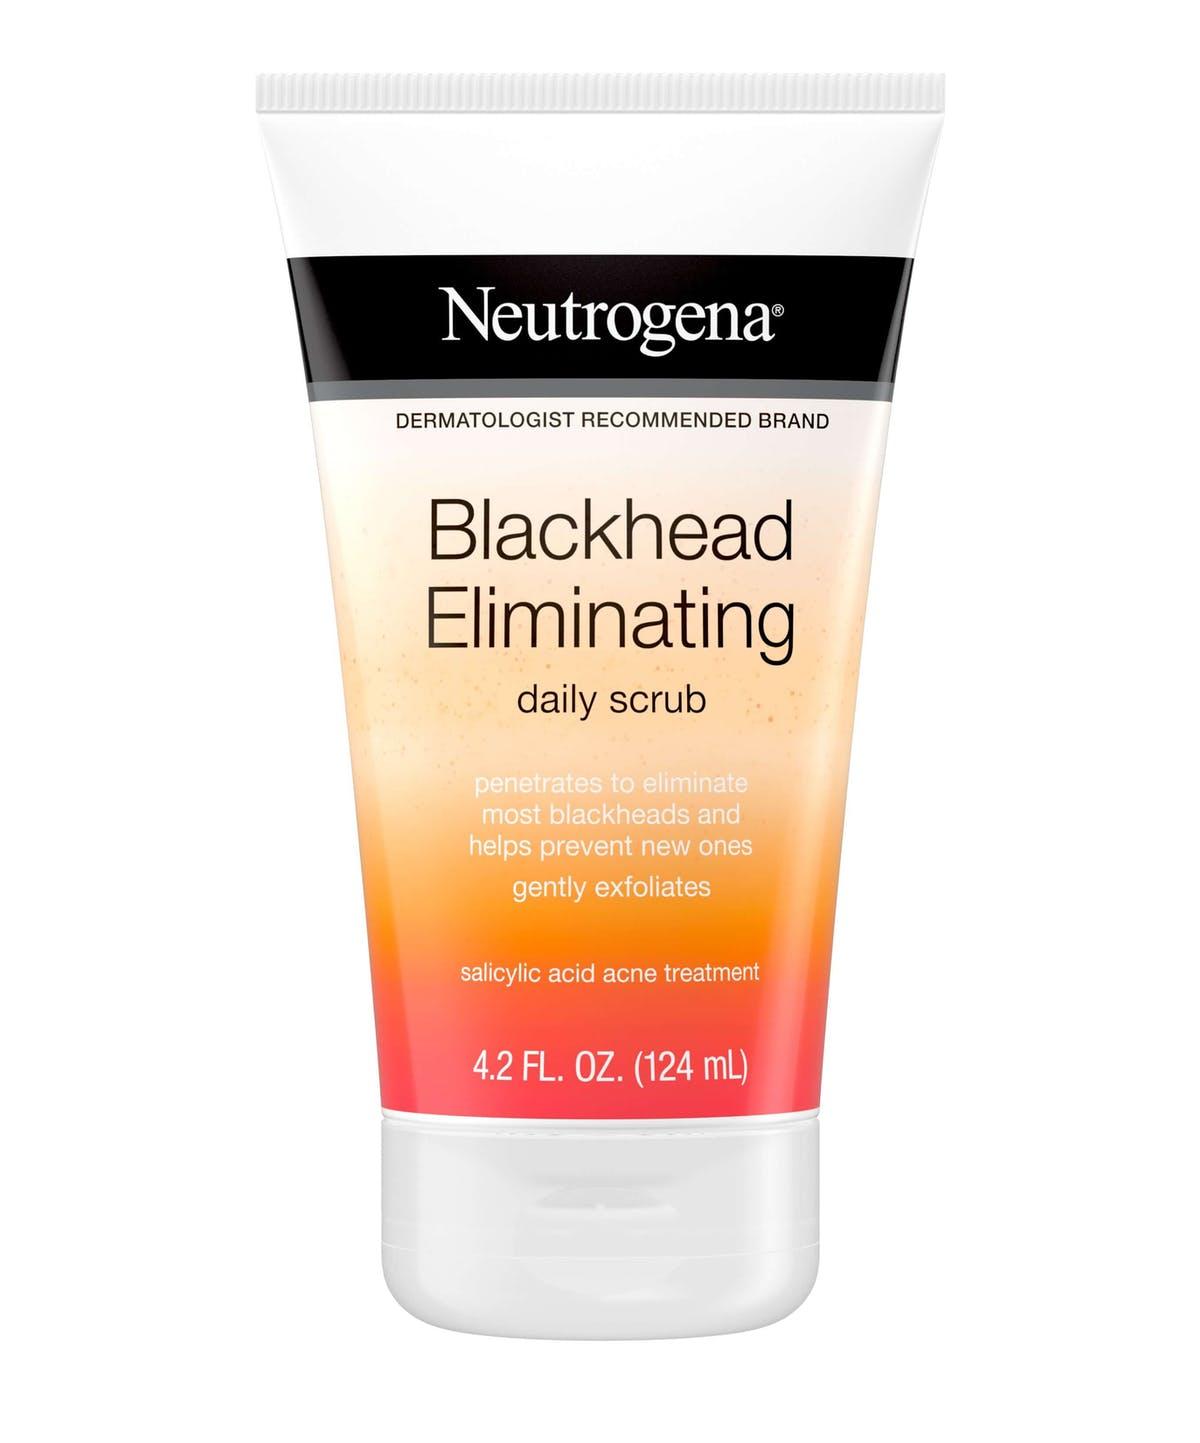 Neutrogena Blackhead Remover Scrub